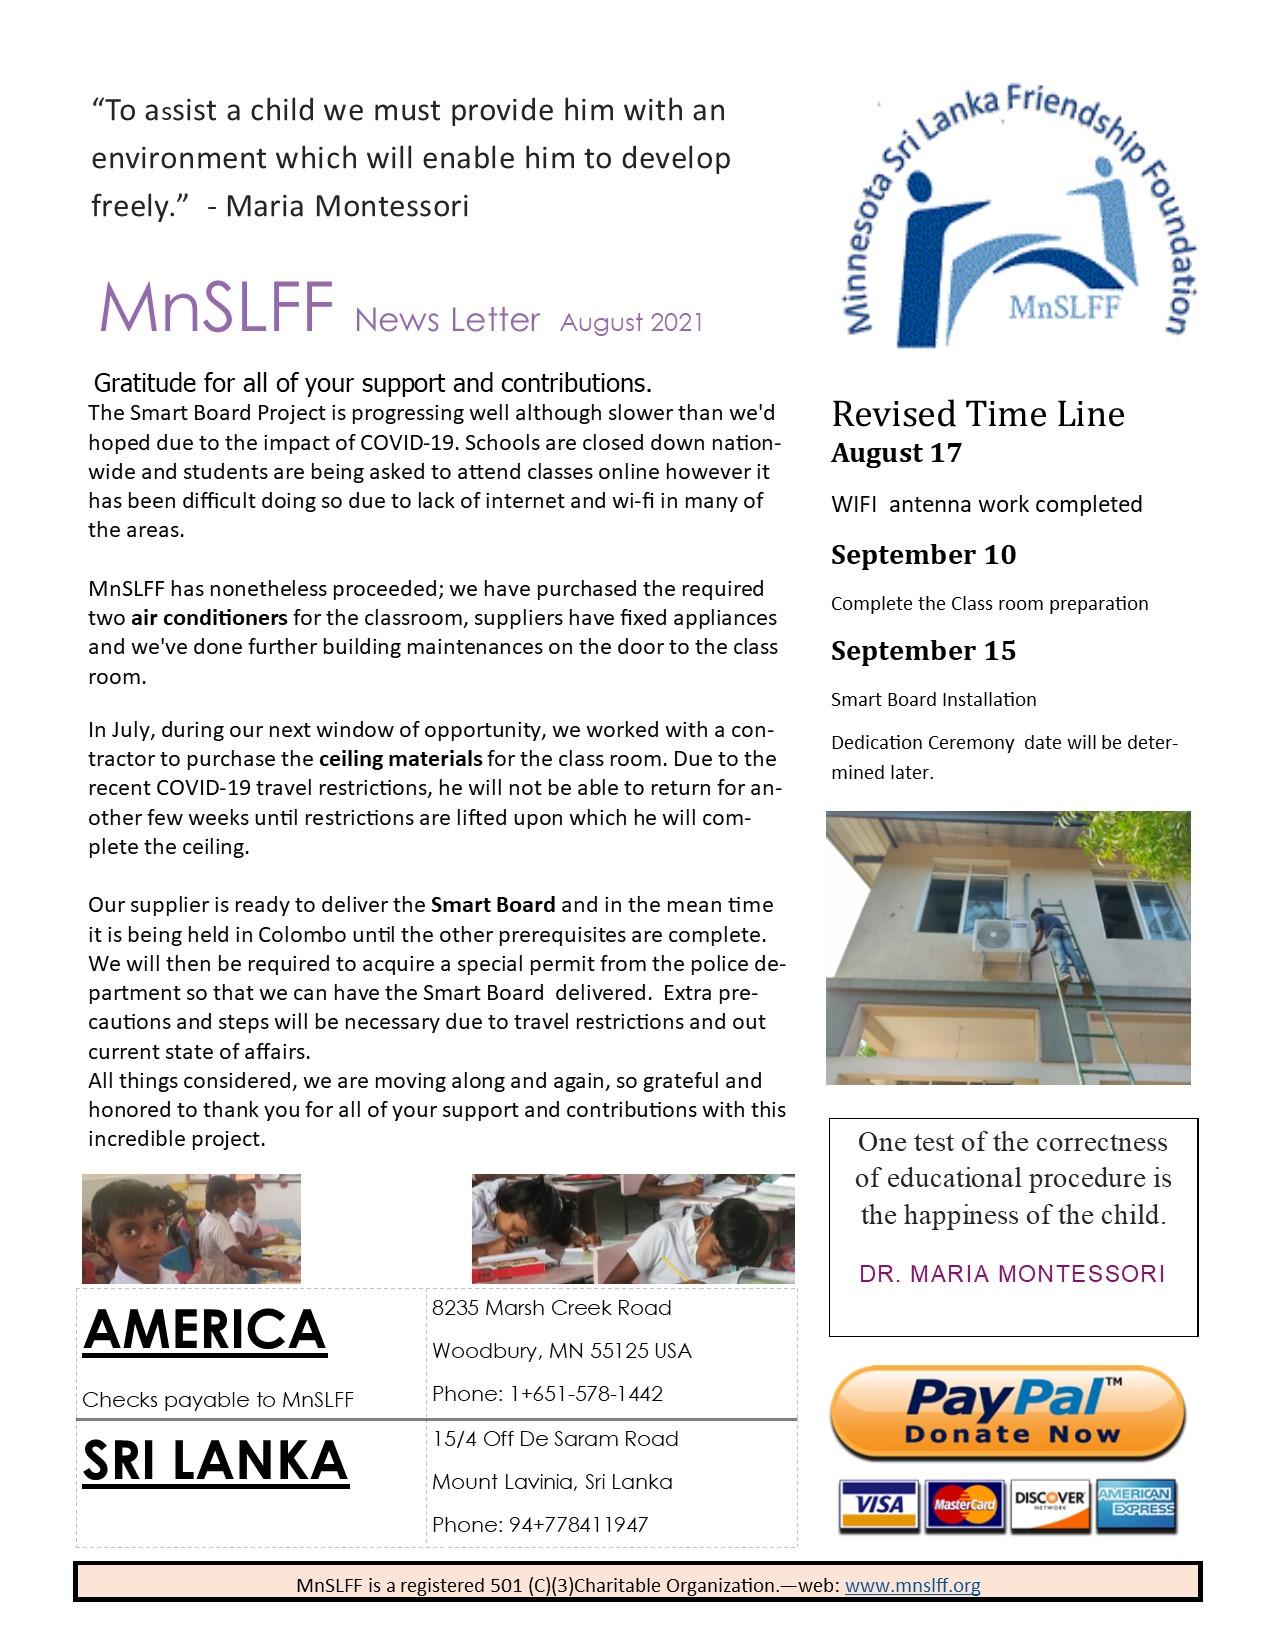 News Letter August 21